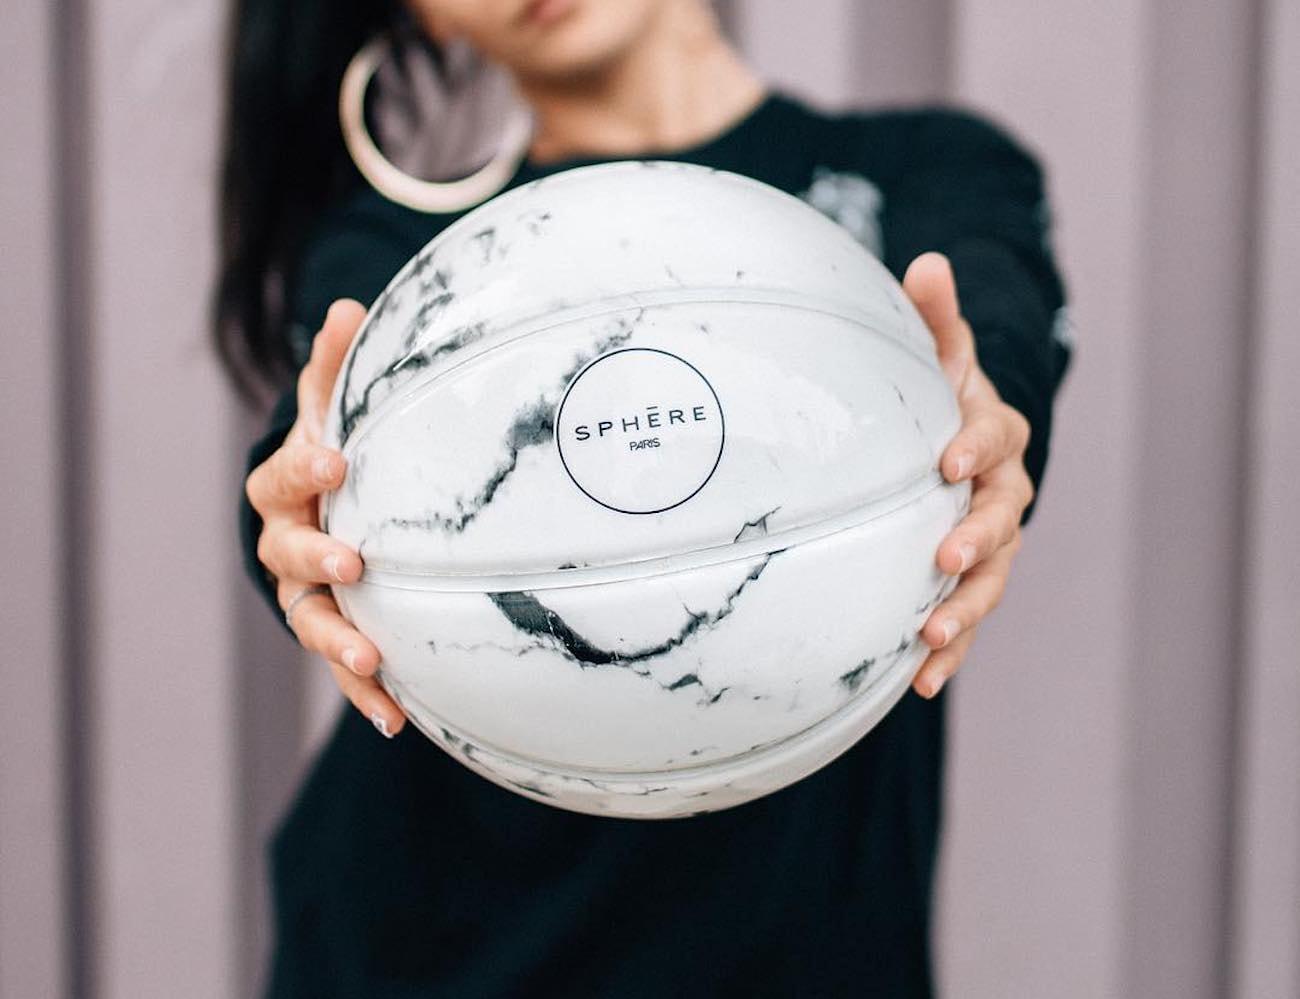 Sphere Paris Stylish Premium Basketballs